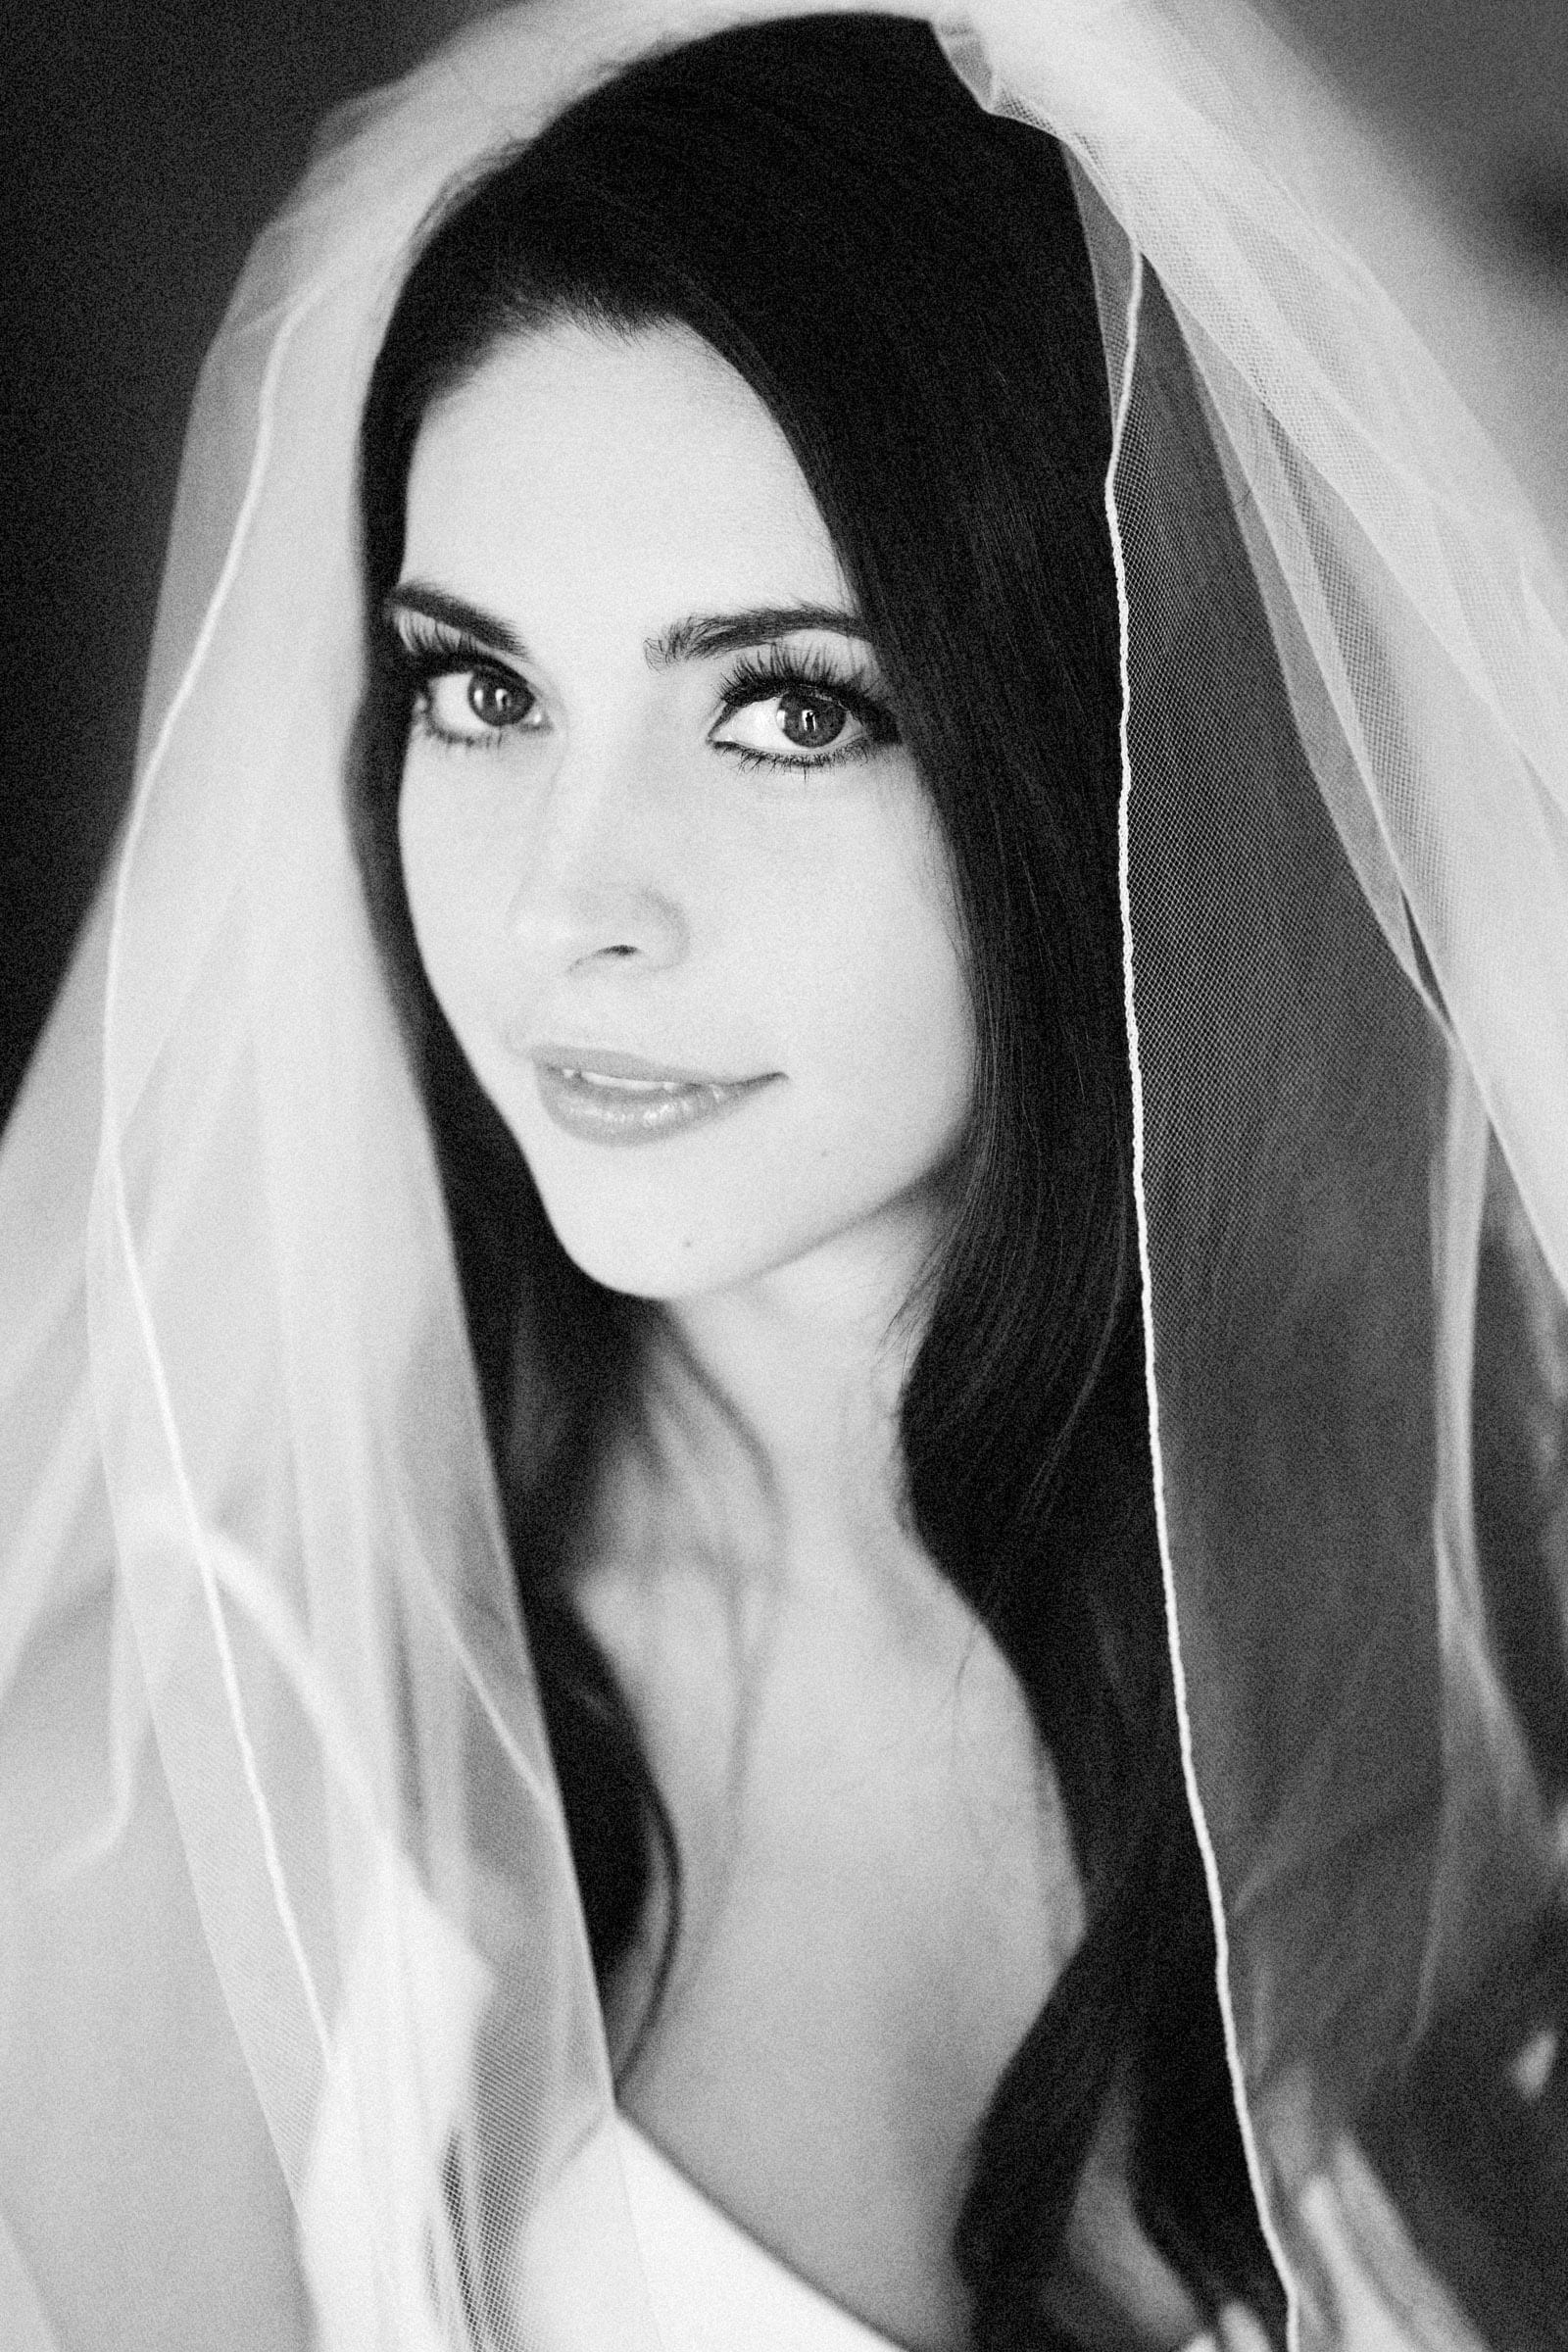 nikki bw bridal portrait 1